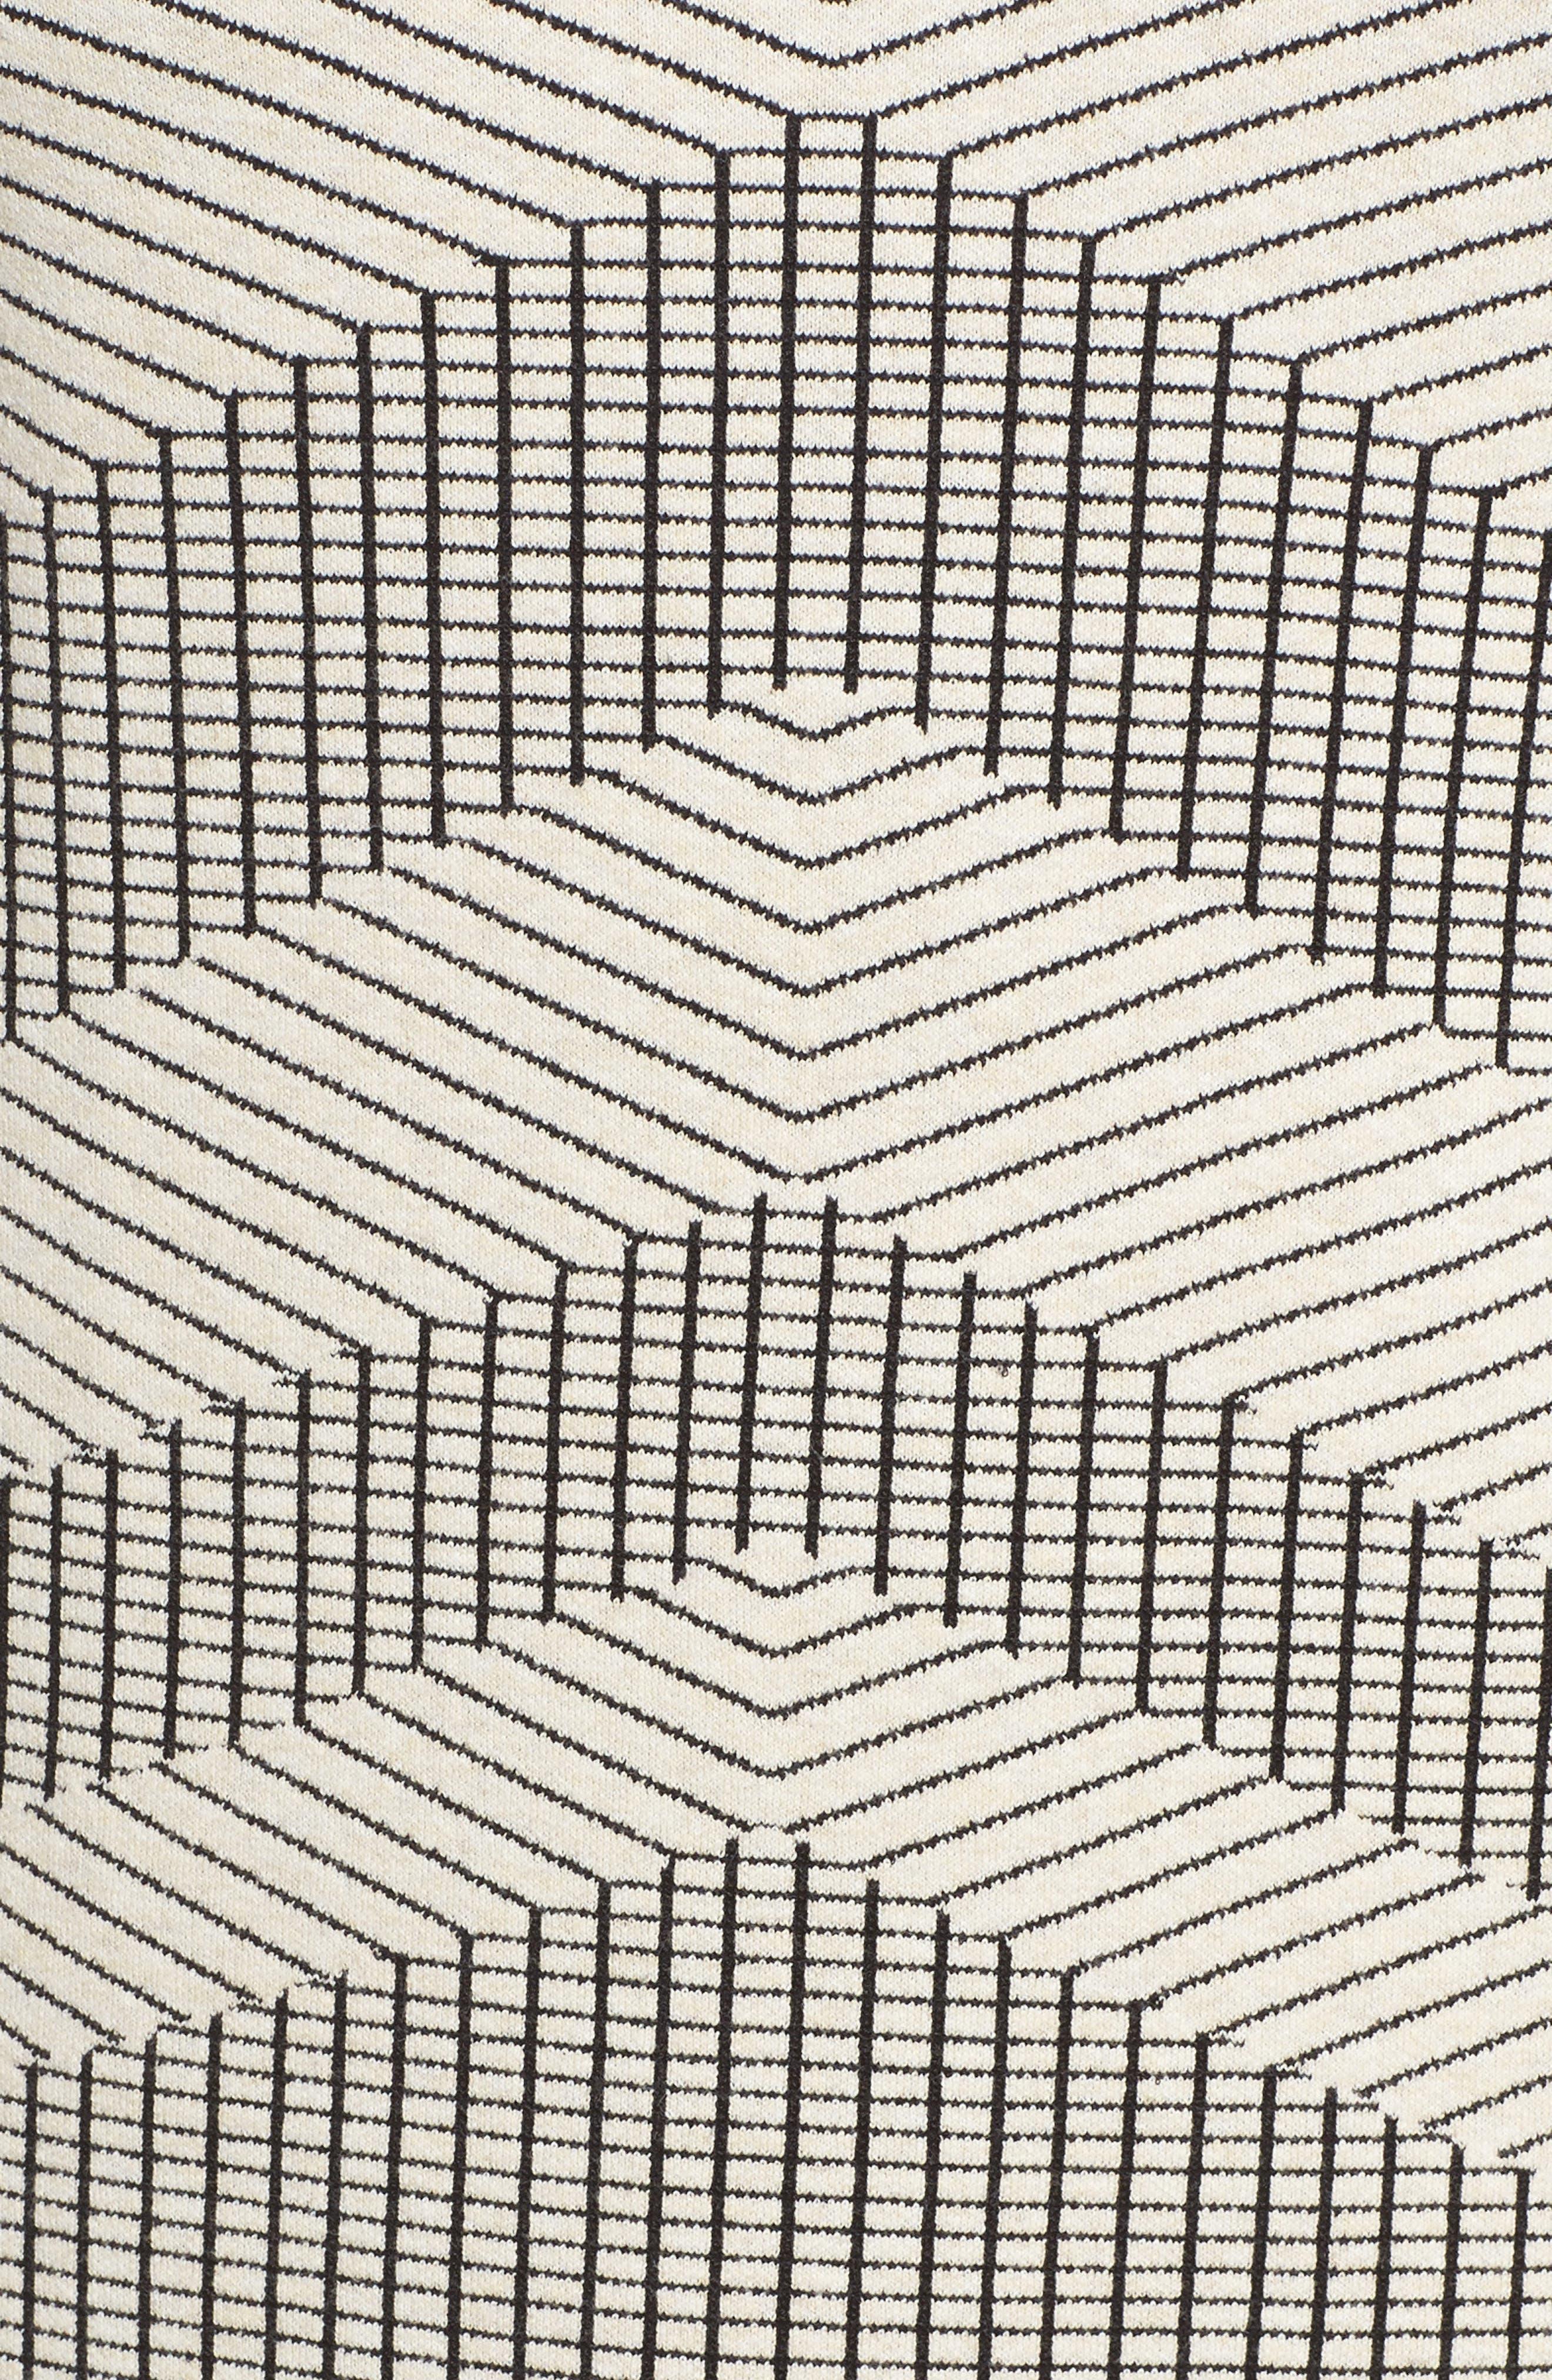 Mantra Chevron Stripe Knit Sheath Dress,                             Alternate thumbnail 5, color,                             Creme Brulee